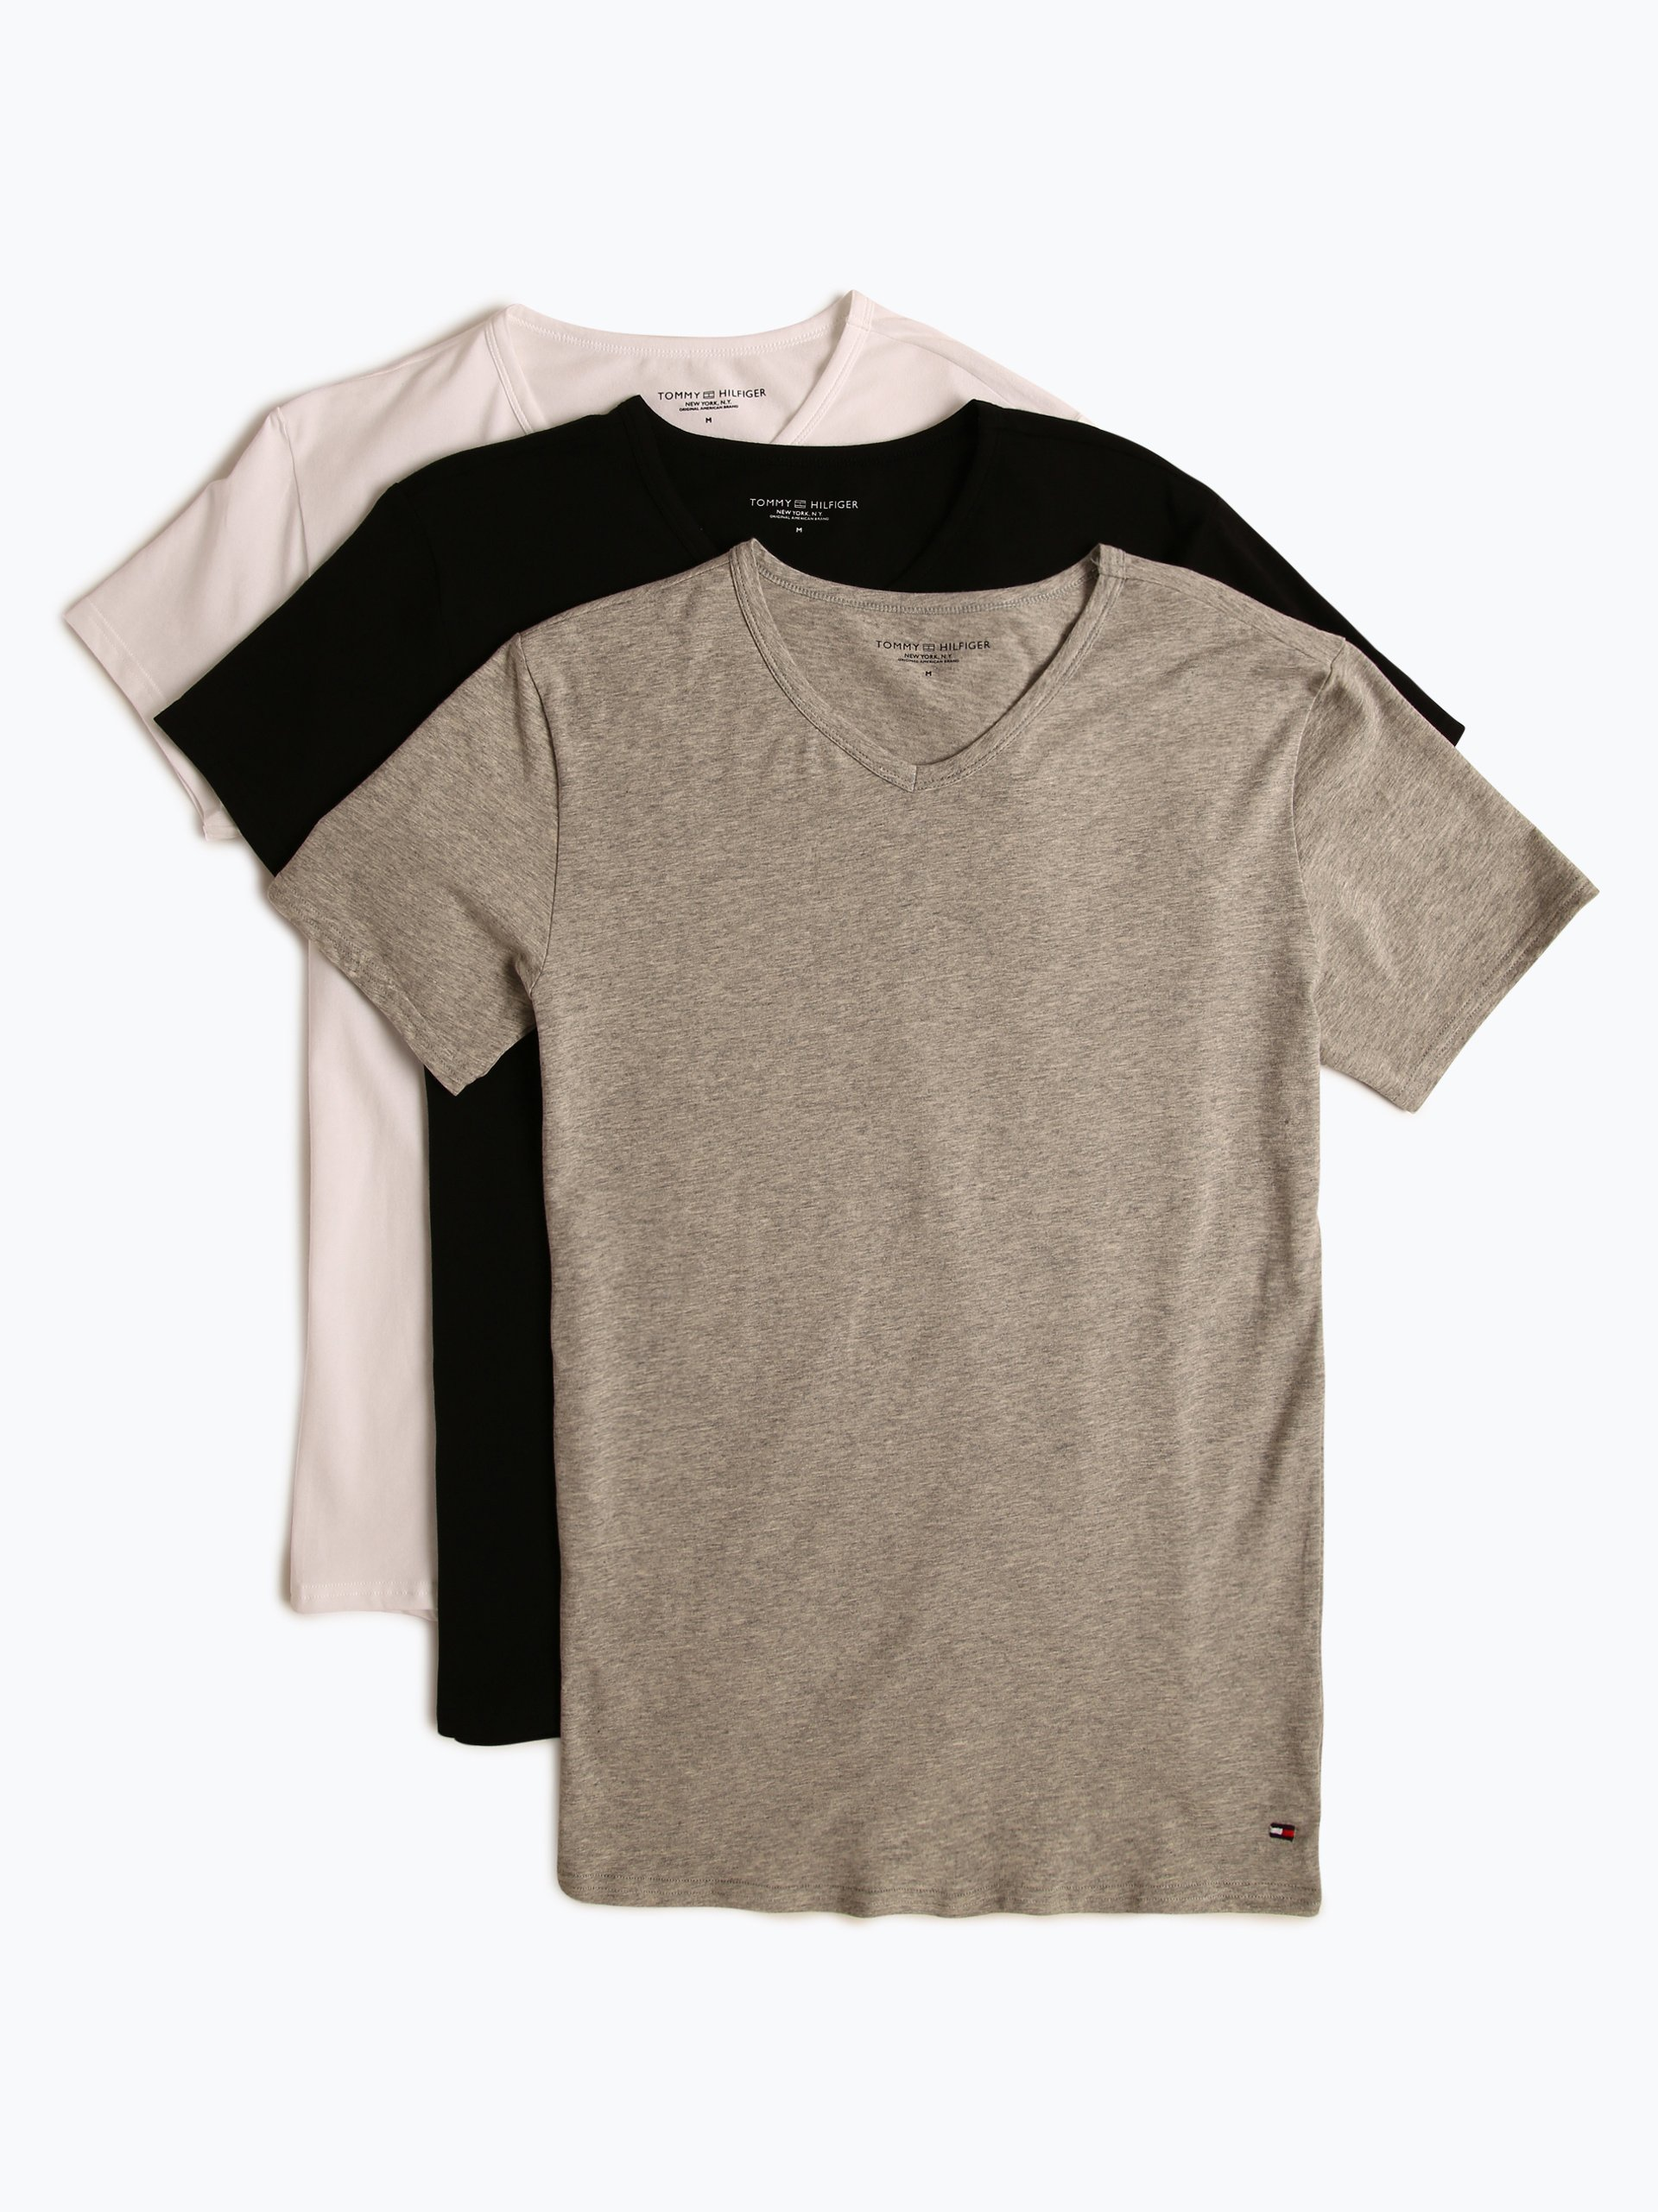 Tommy Hilfiger T-shirty męskie pakowane po 3 szt.